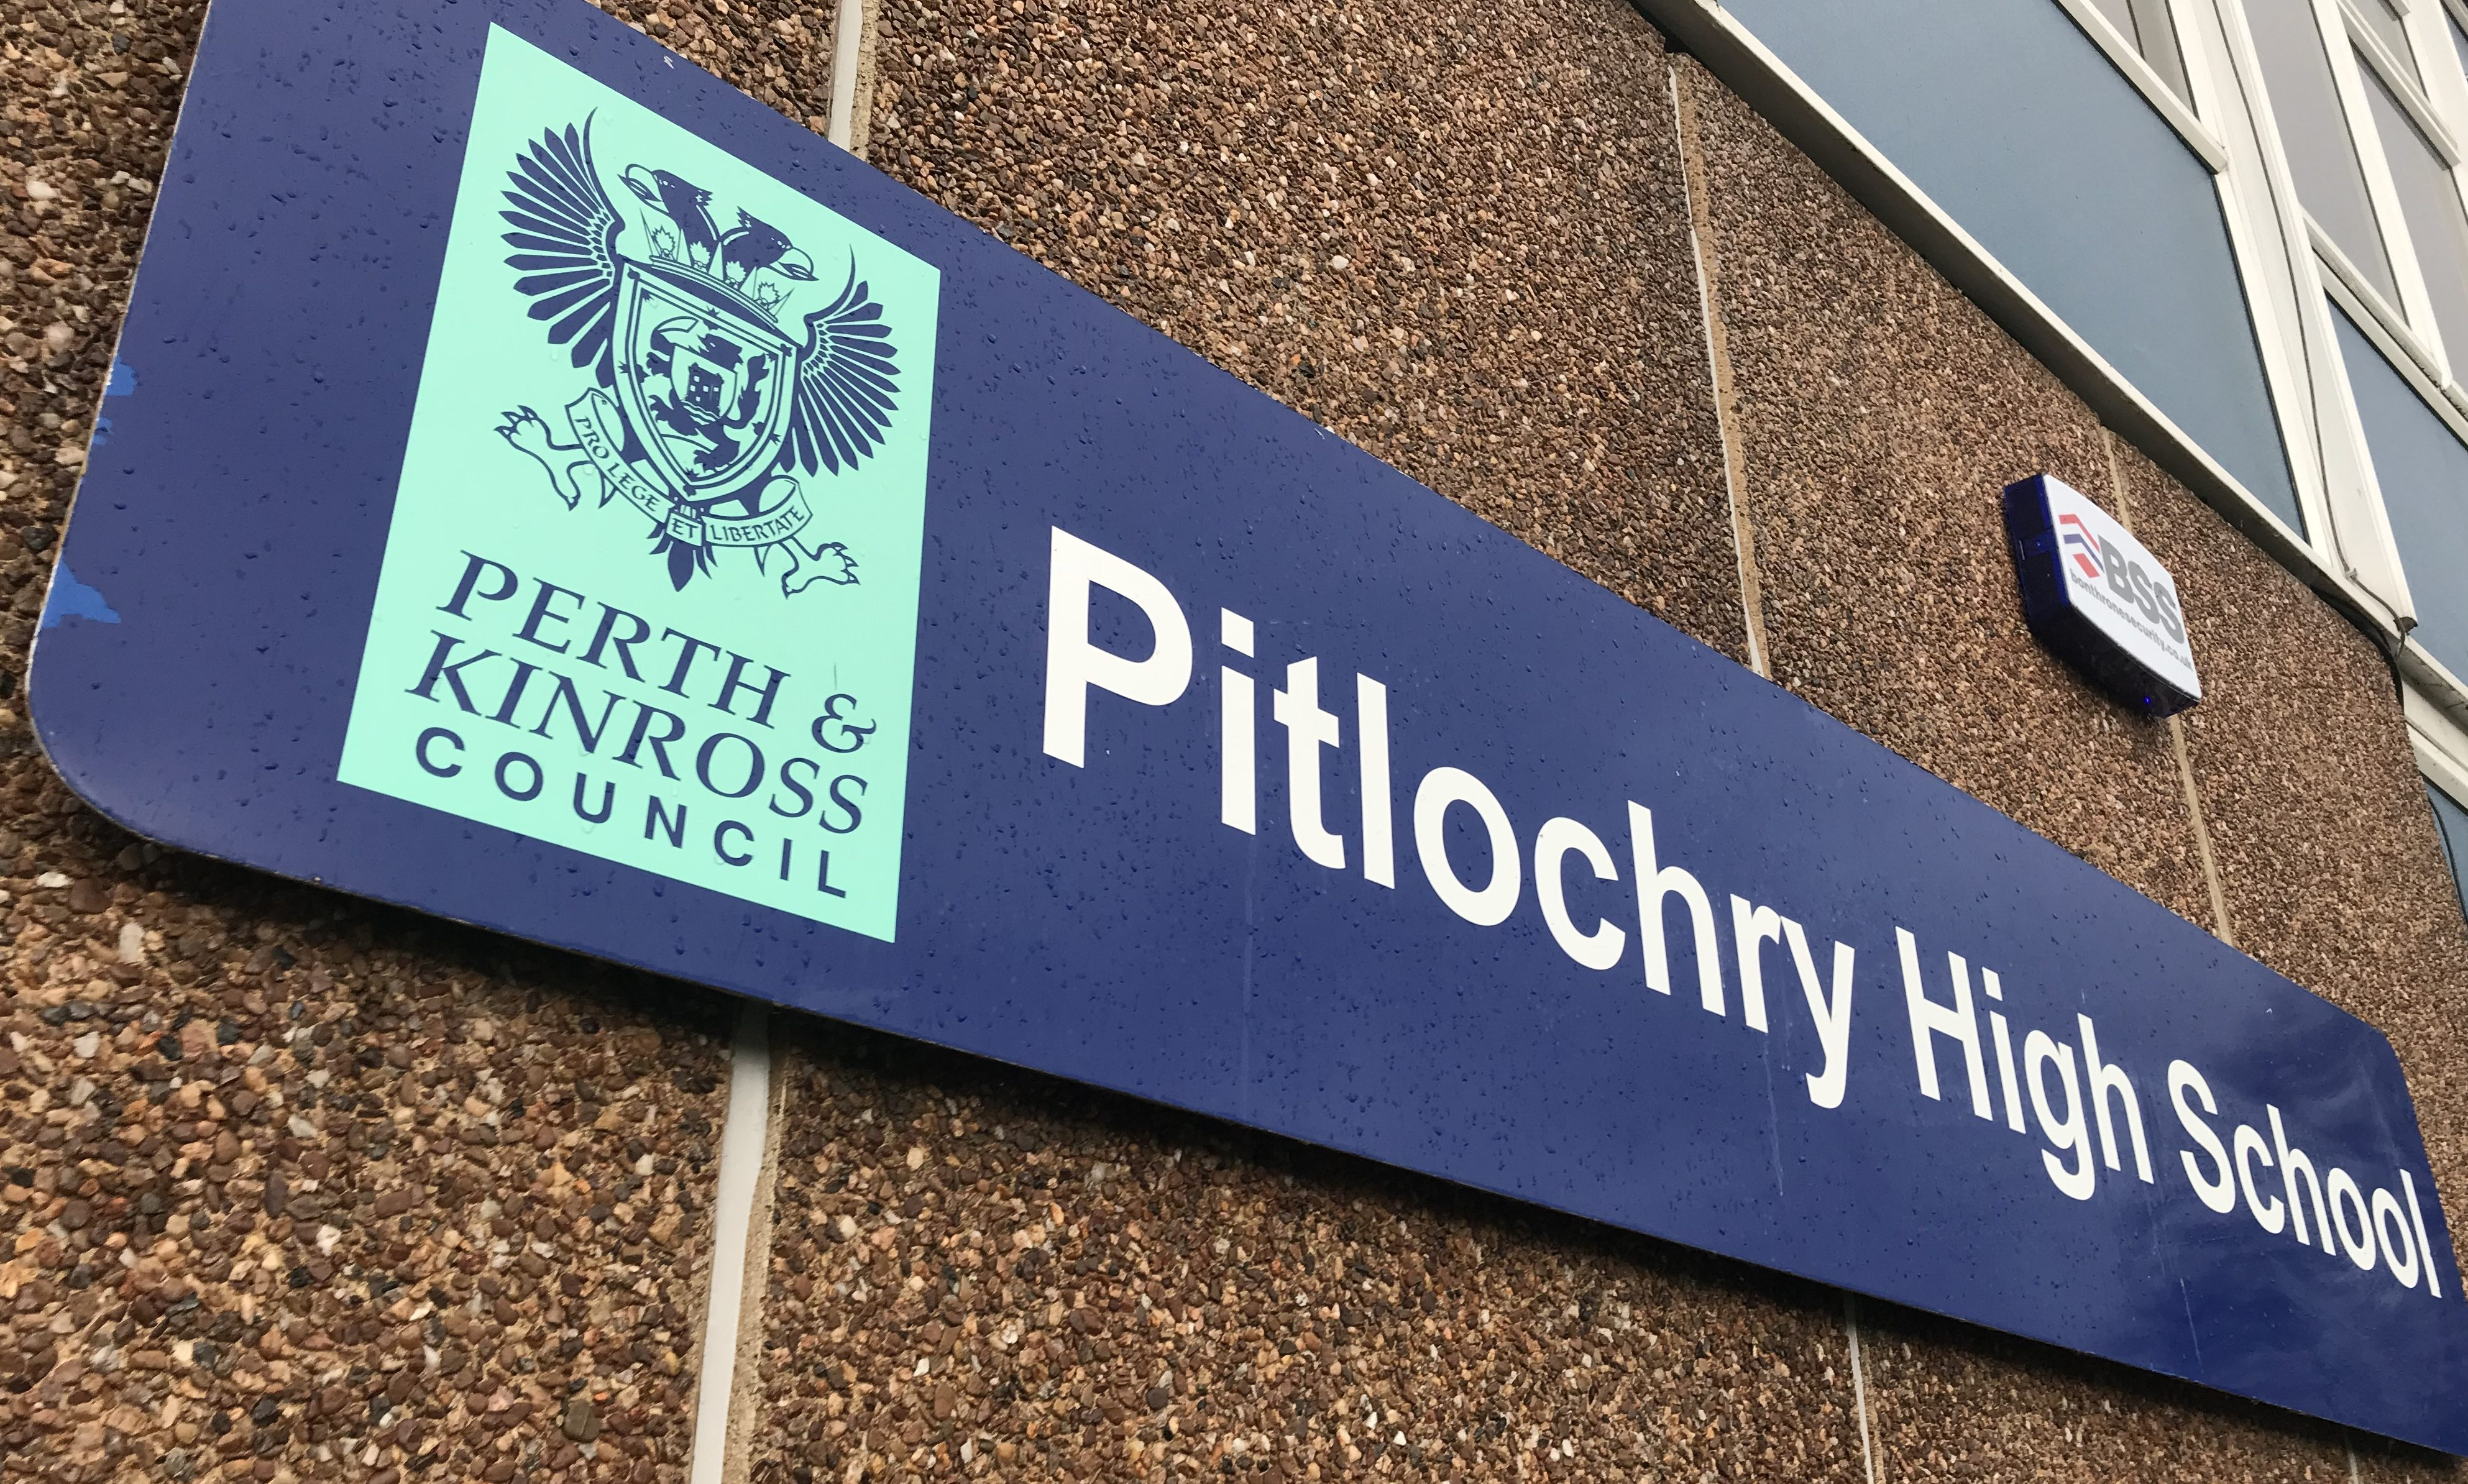 Pitlochry HIgh School